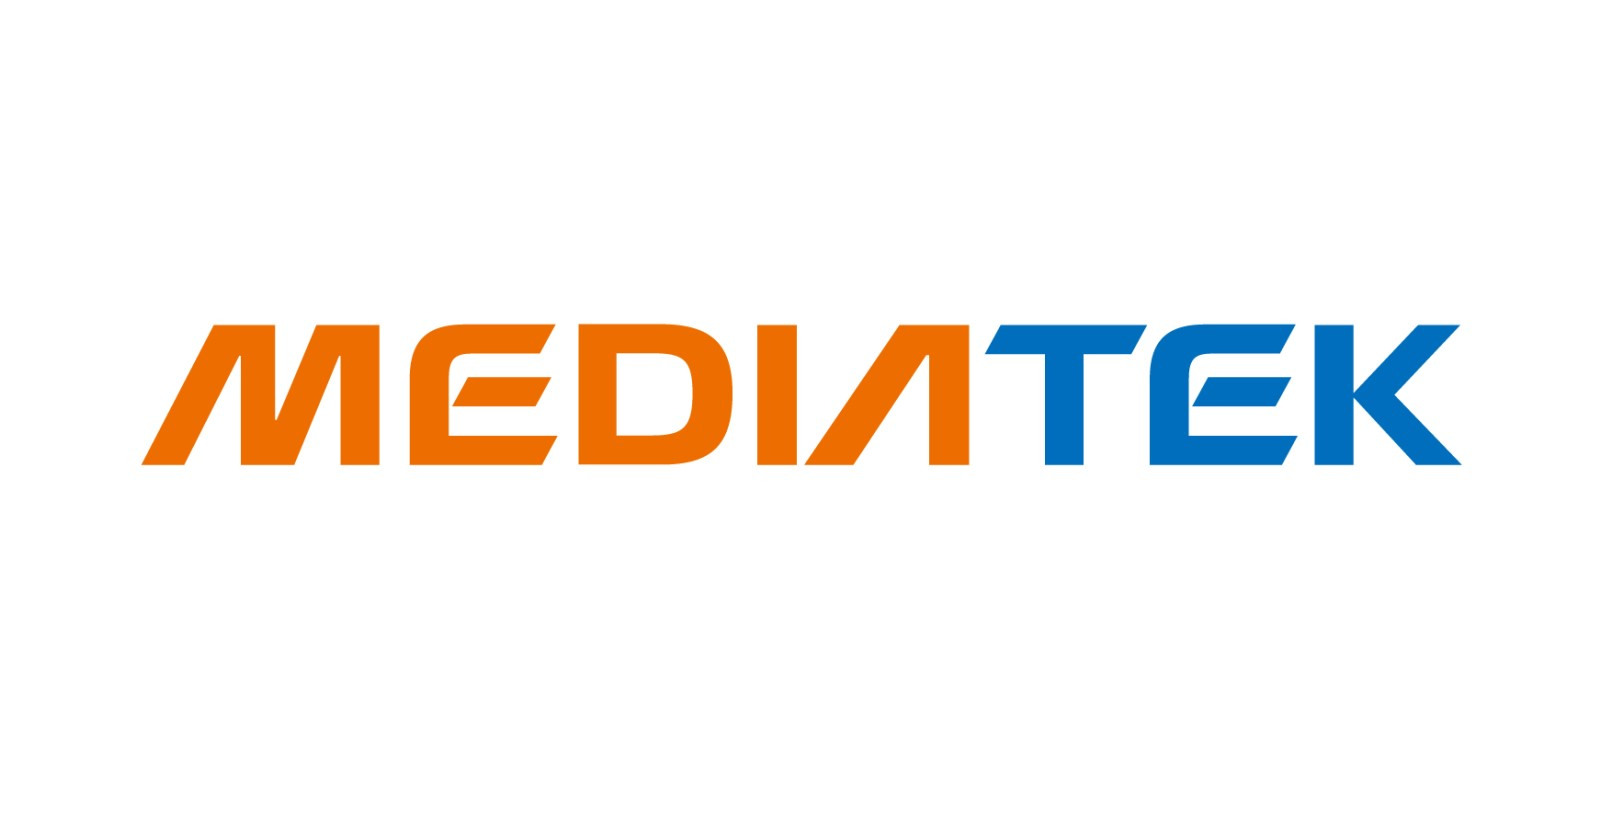 MediaTek uzavřel novou dohodu s ARM